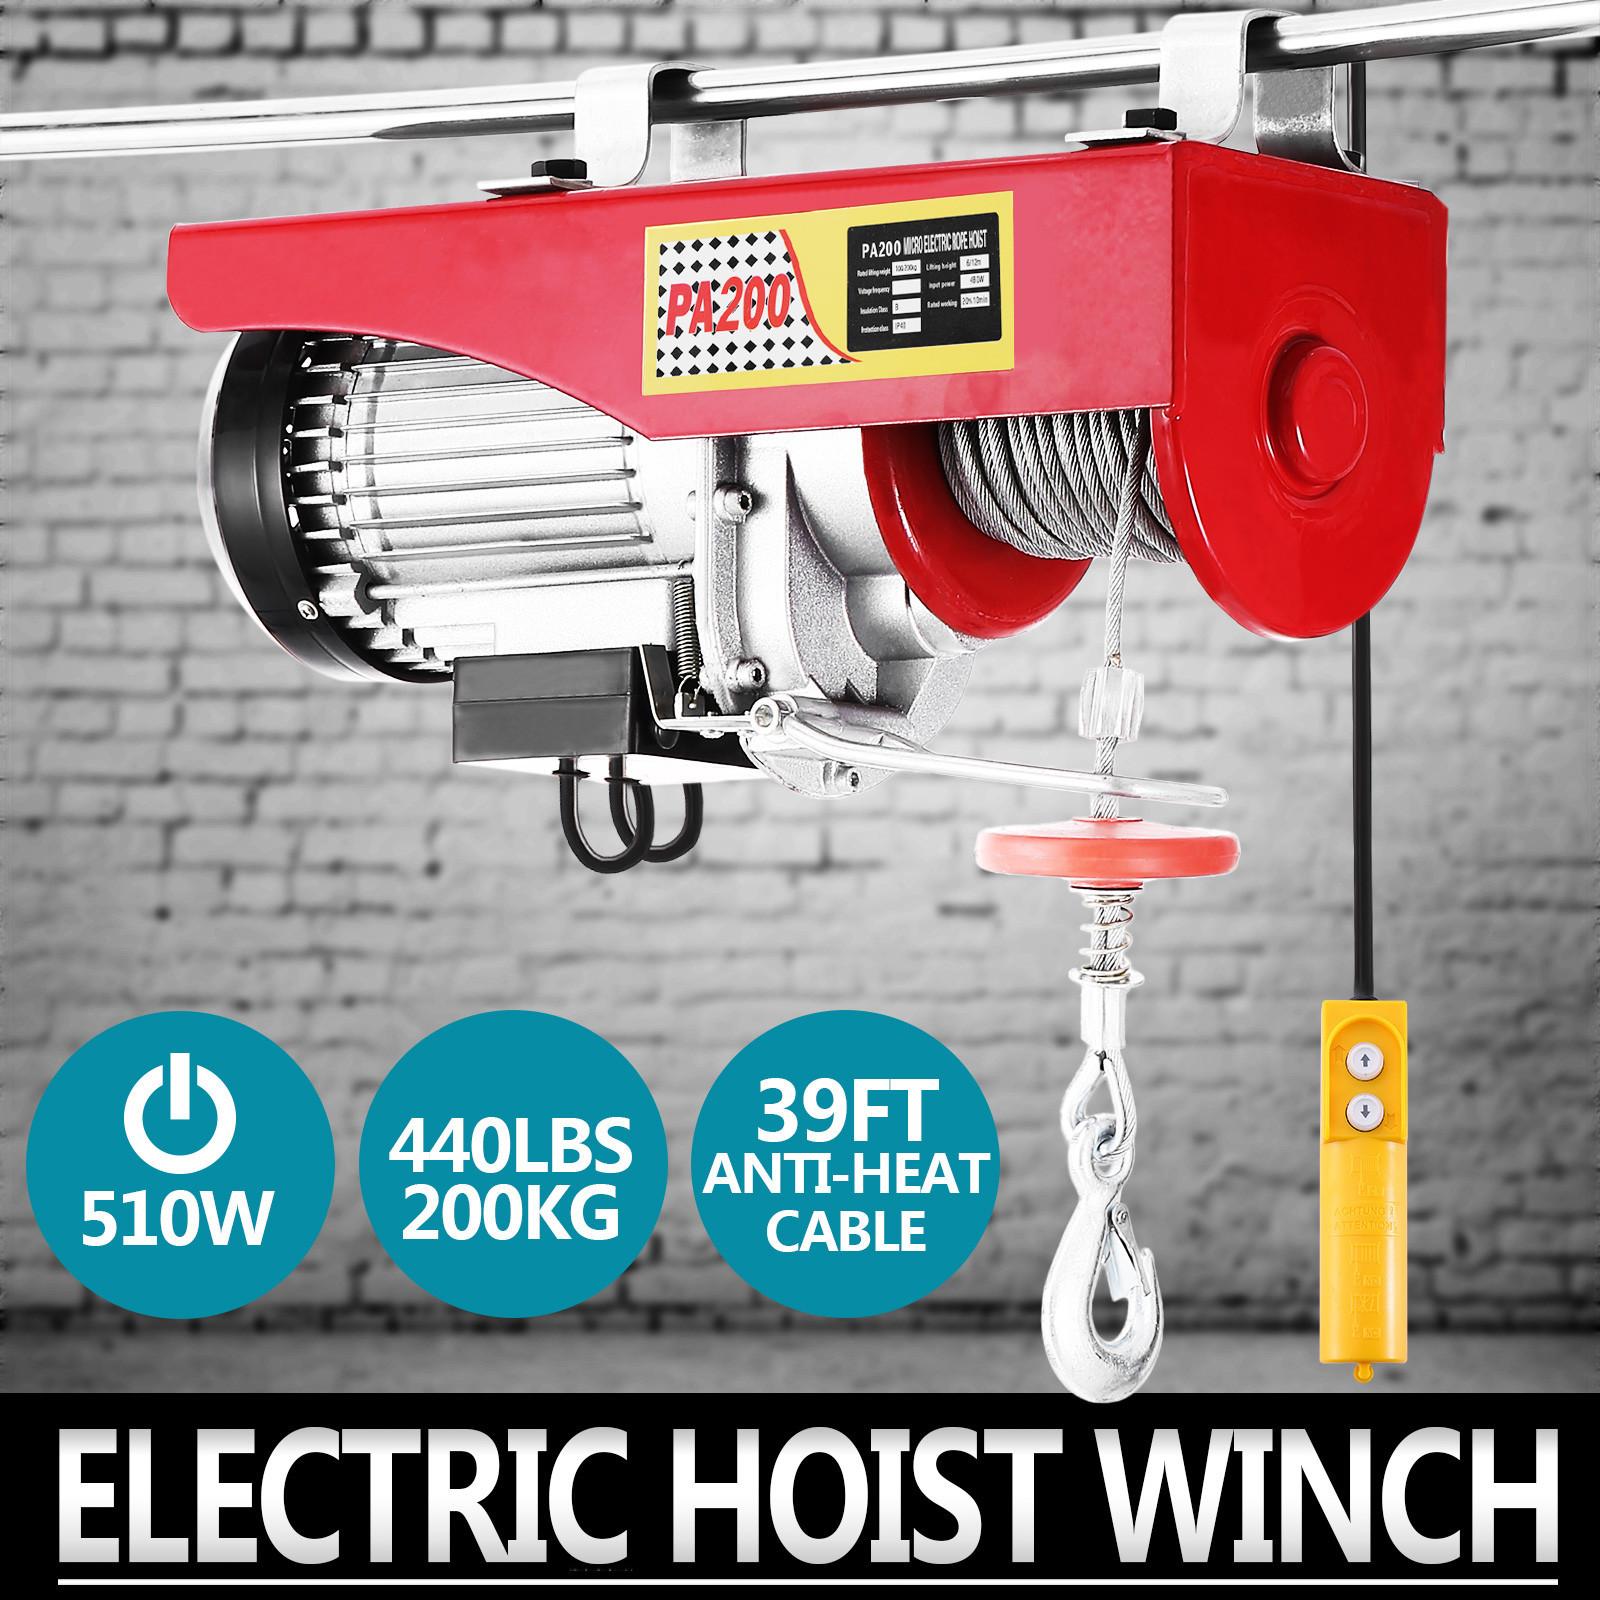 100kg-900kg-Electric-Hoist-Winch-Lifting-Engine-Crane-Cable-Lift-Hook-Garage miniature 13